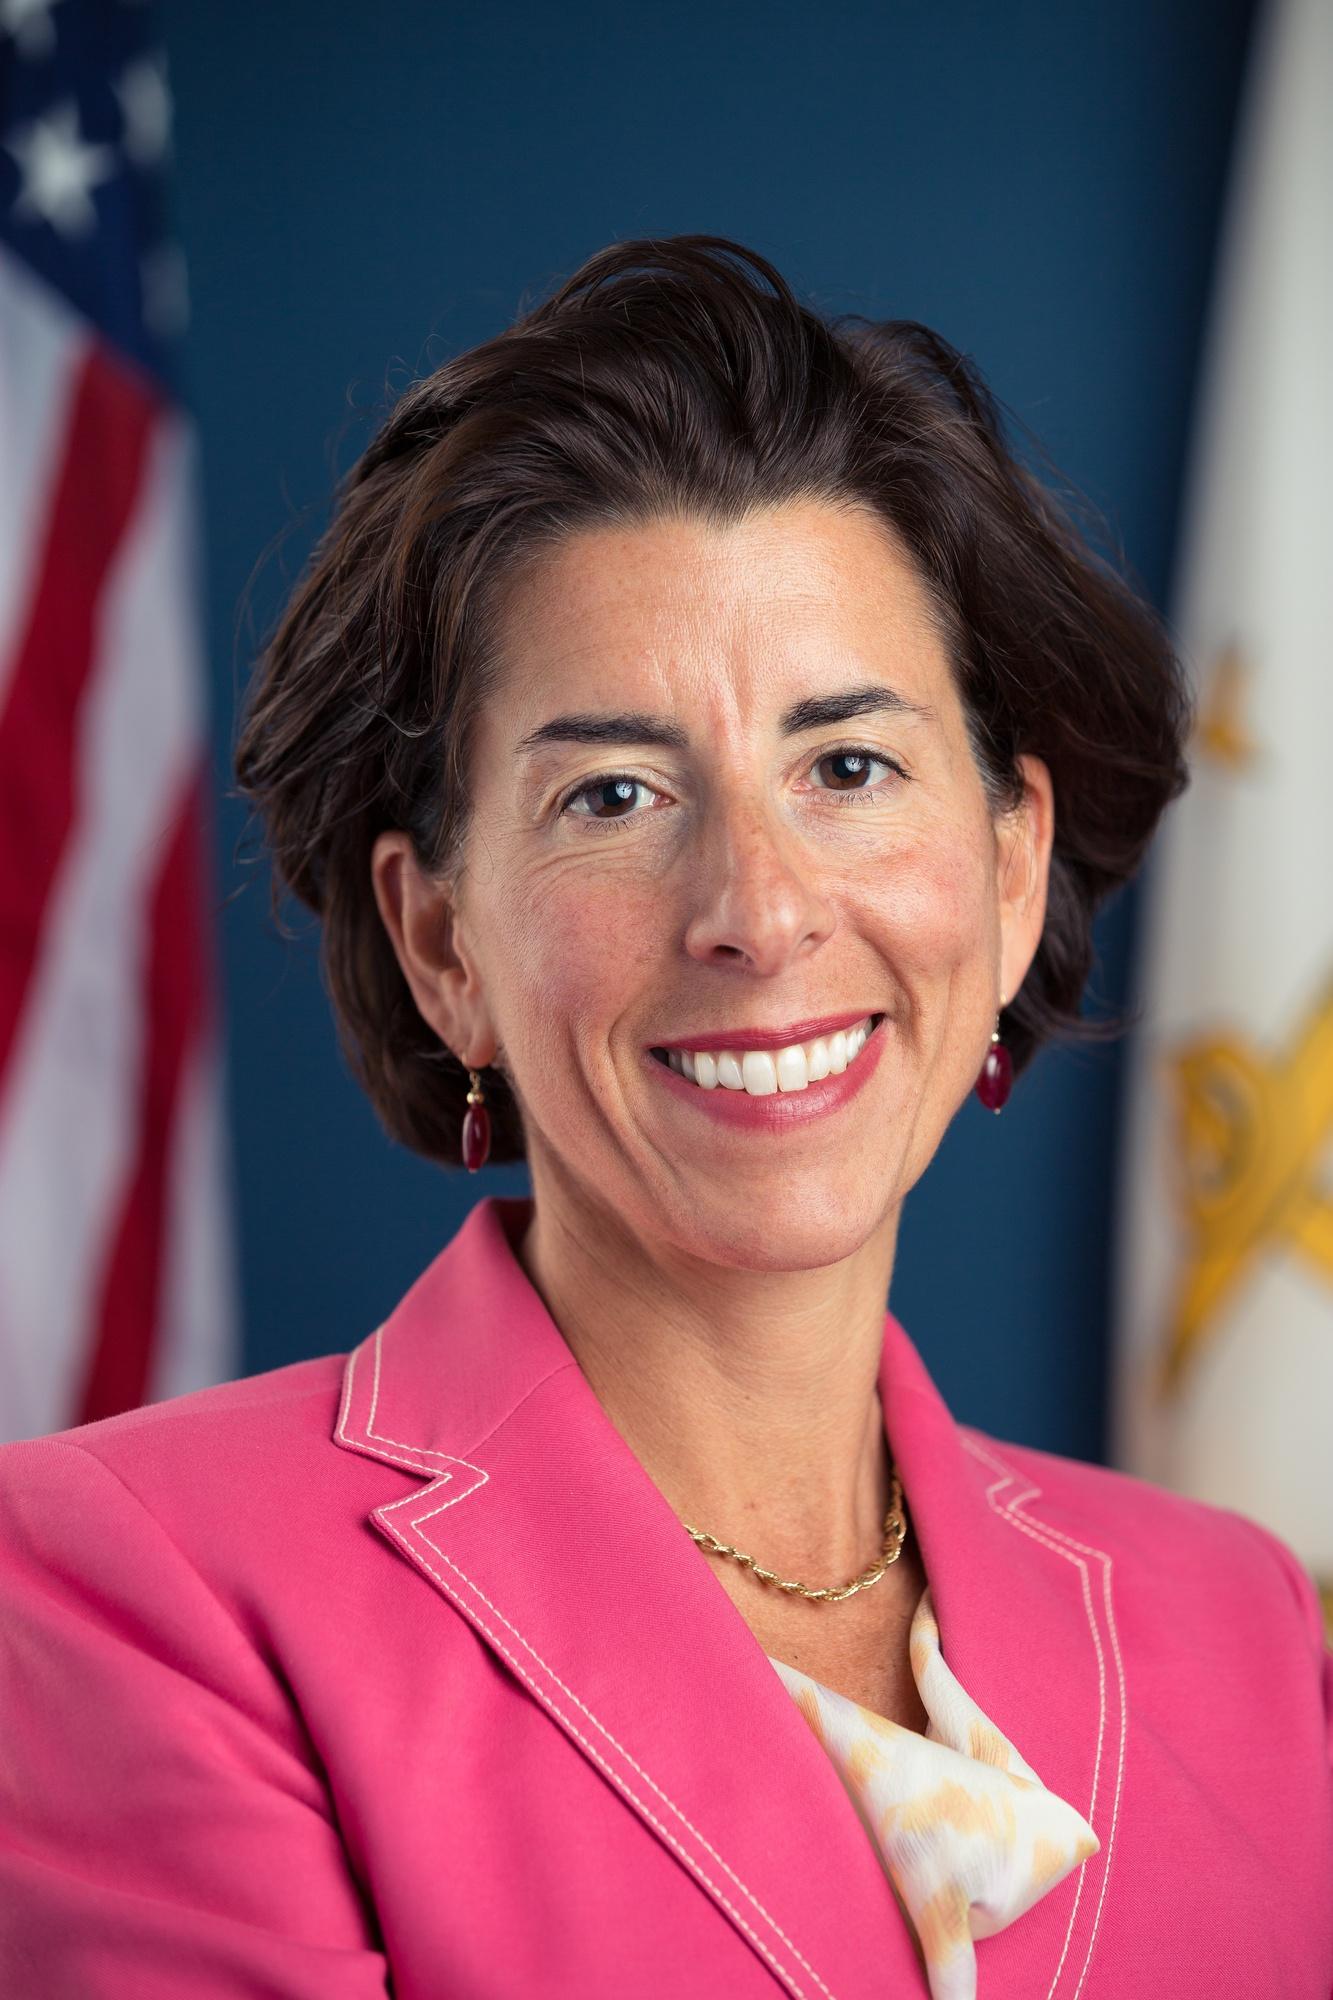 Gina Raimondo '93 currently serves as the governor of Rhode Island.